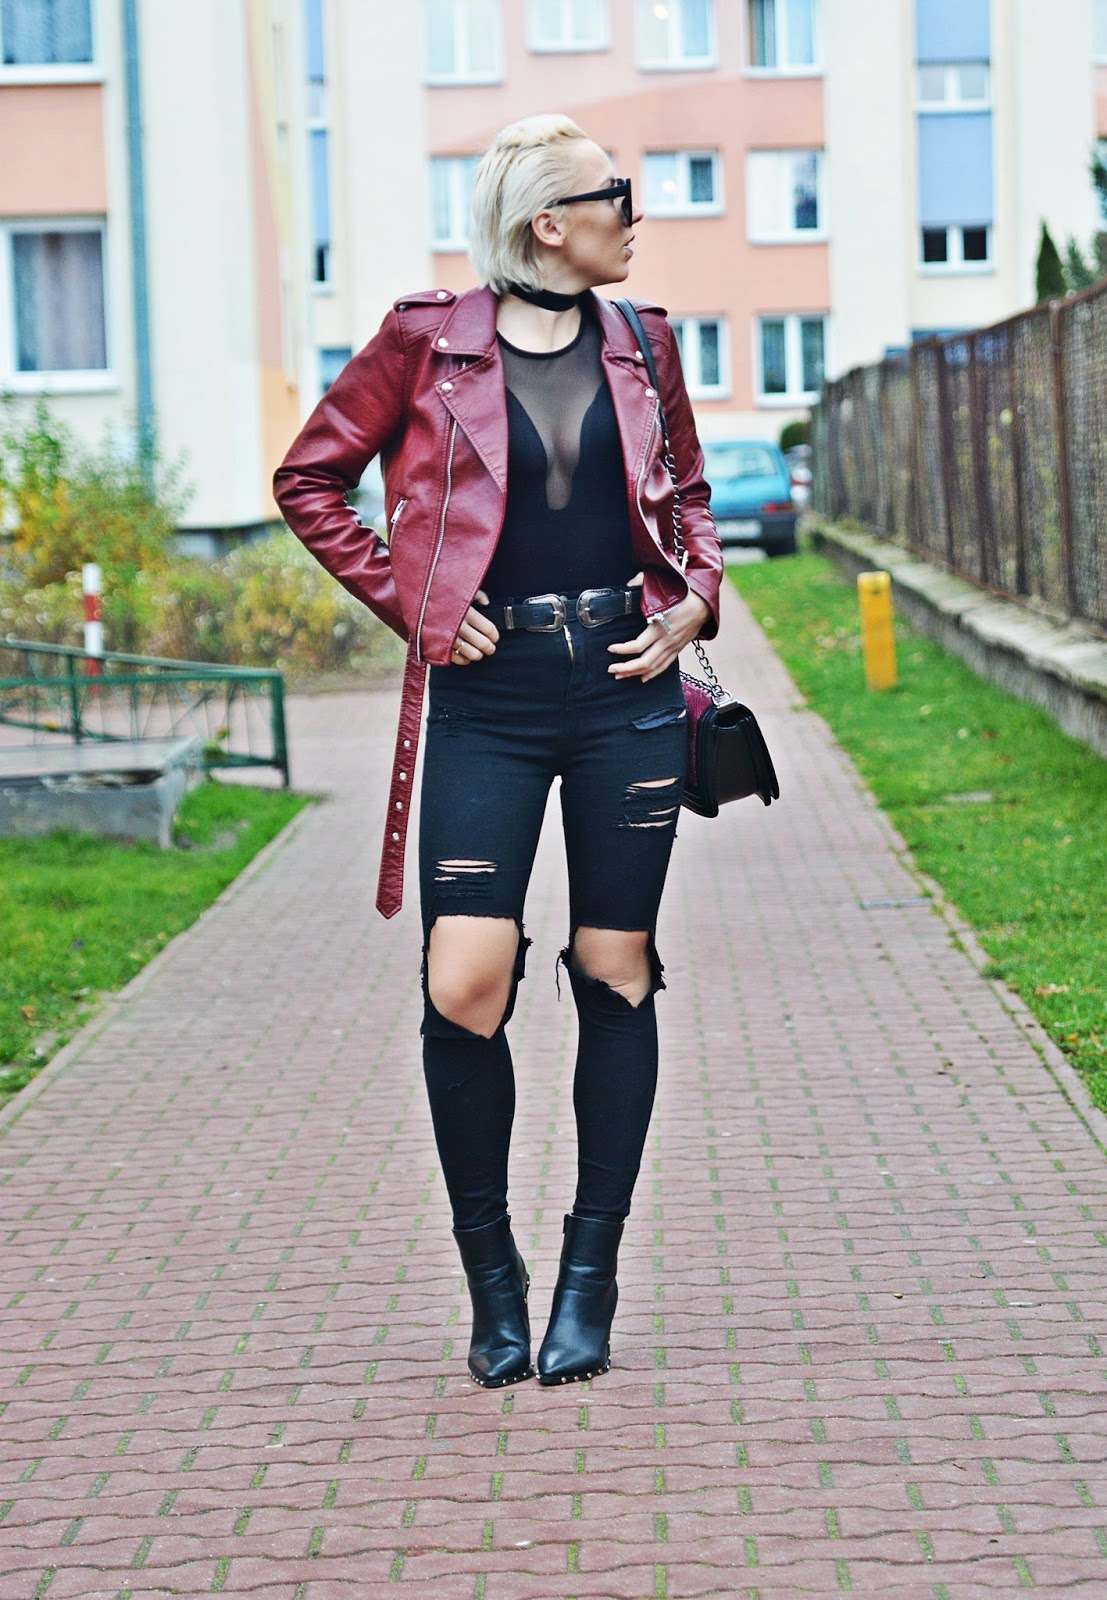 podwojny_pasek_blog_modowy_karyn_bordowa_ramoneska